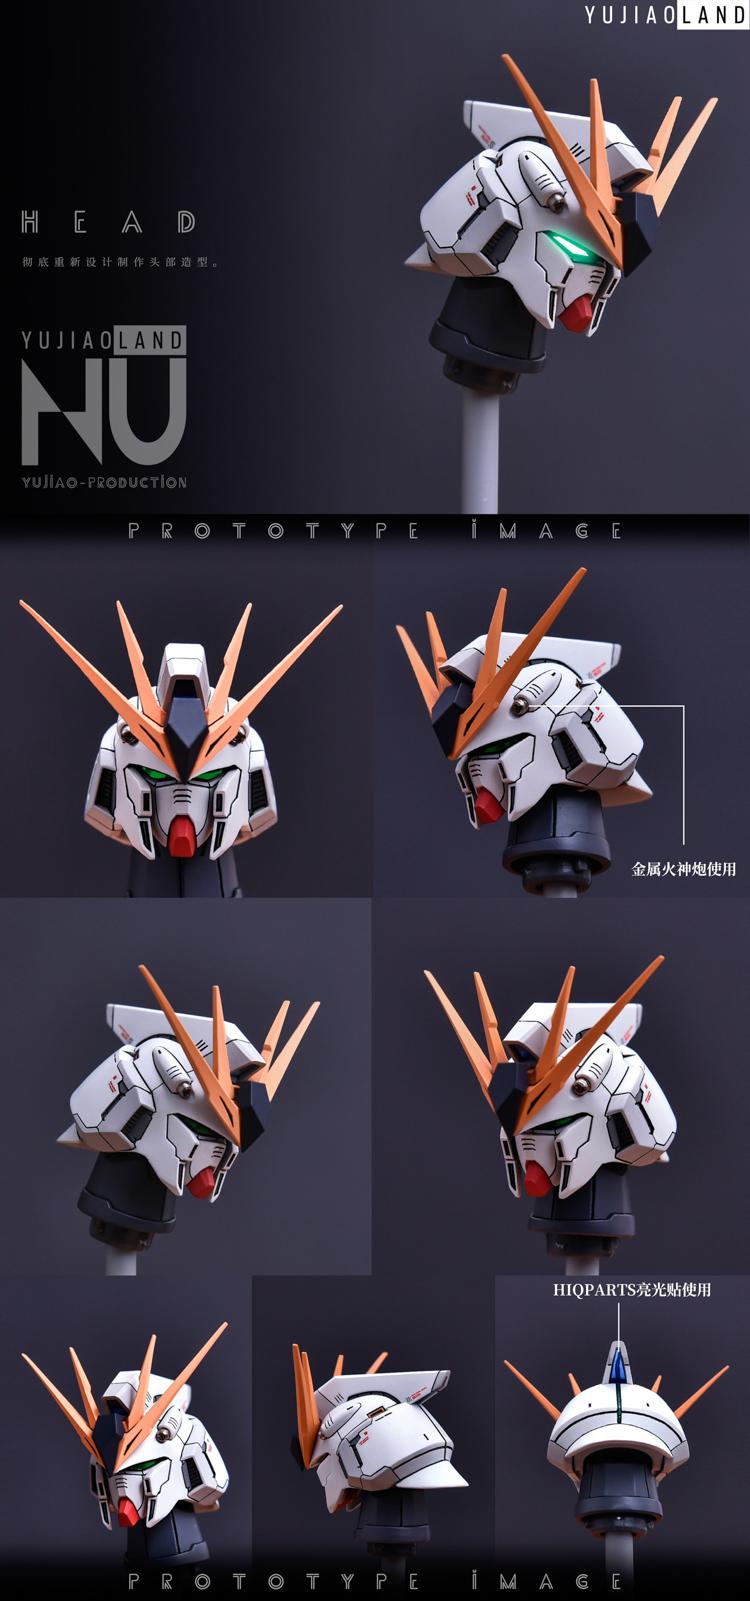 G778_yujiaoland_MG_nu_039.jpg